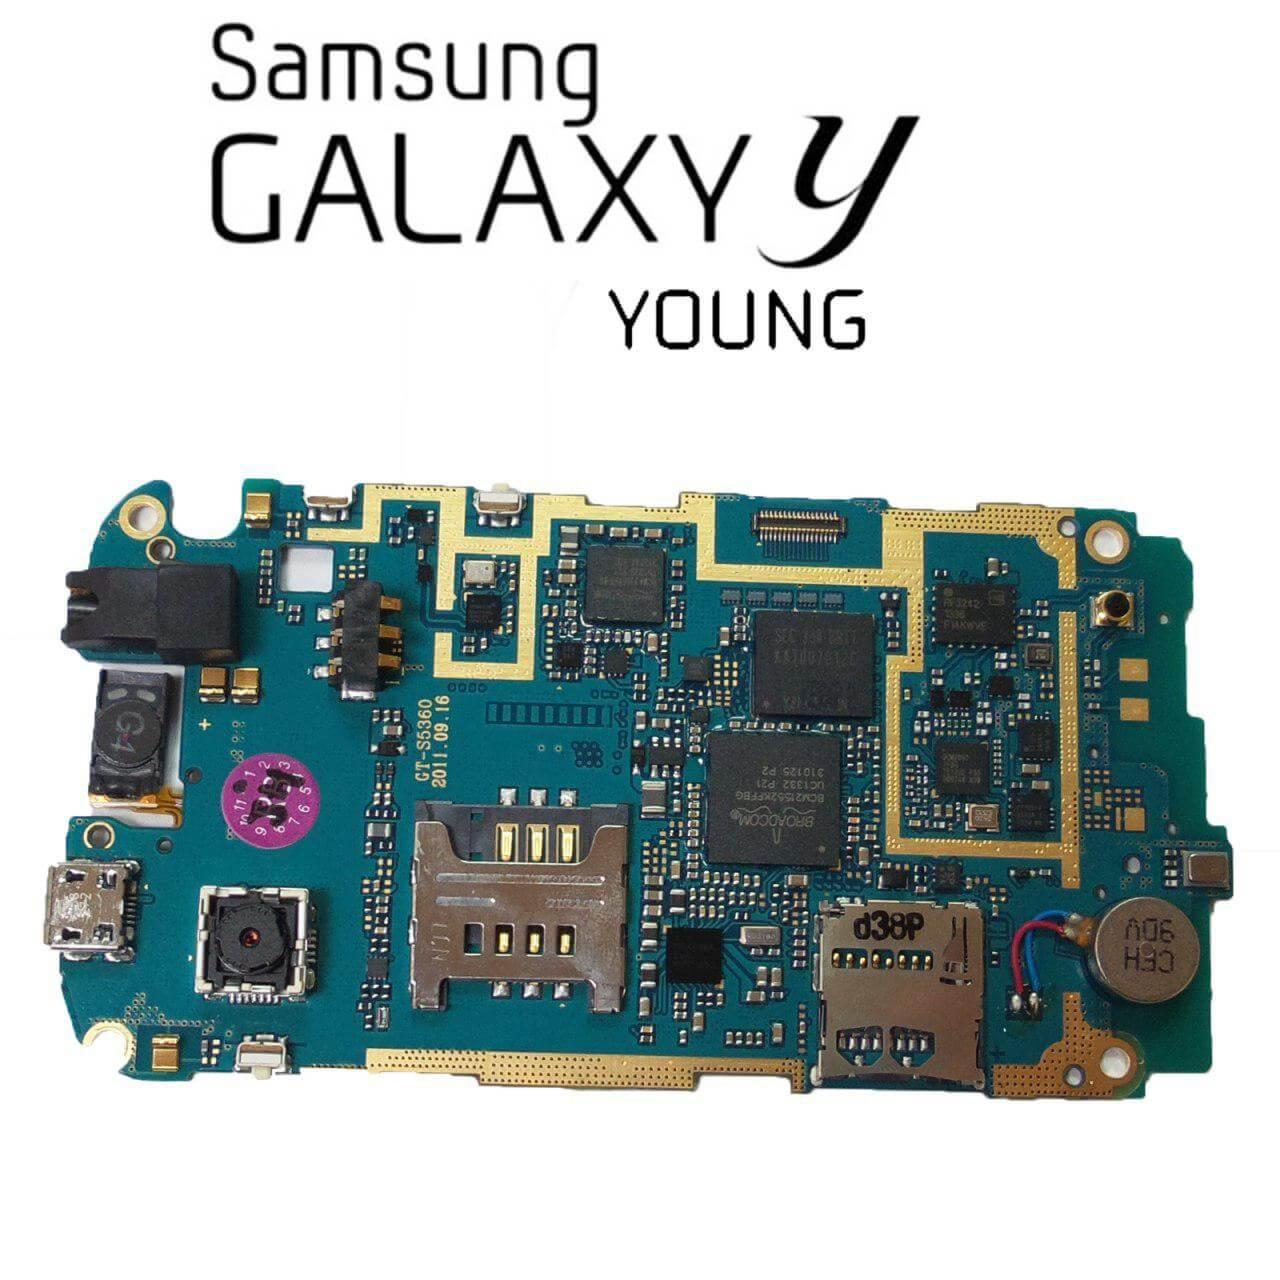 samsung-galaxy-Y-GT-S5360-Logic-Board-PCB-Mainboard-Motherboard.jpg